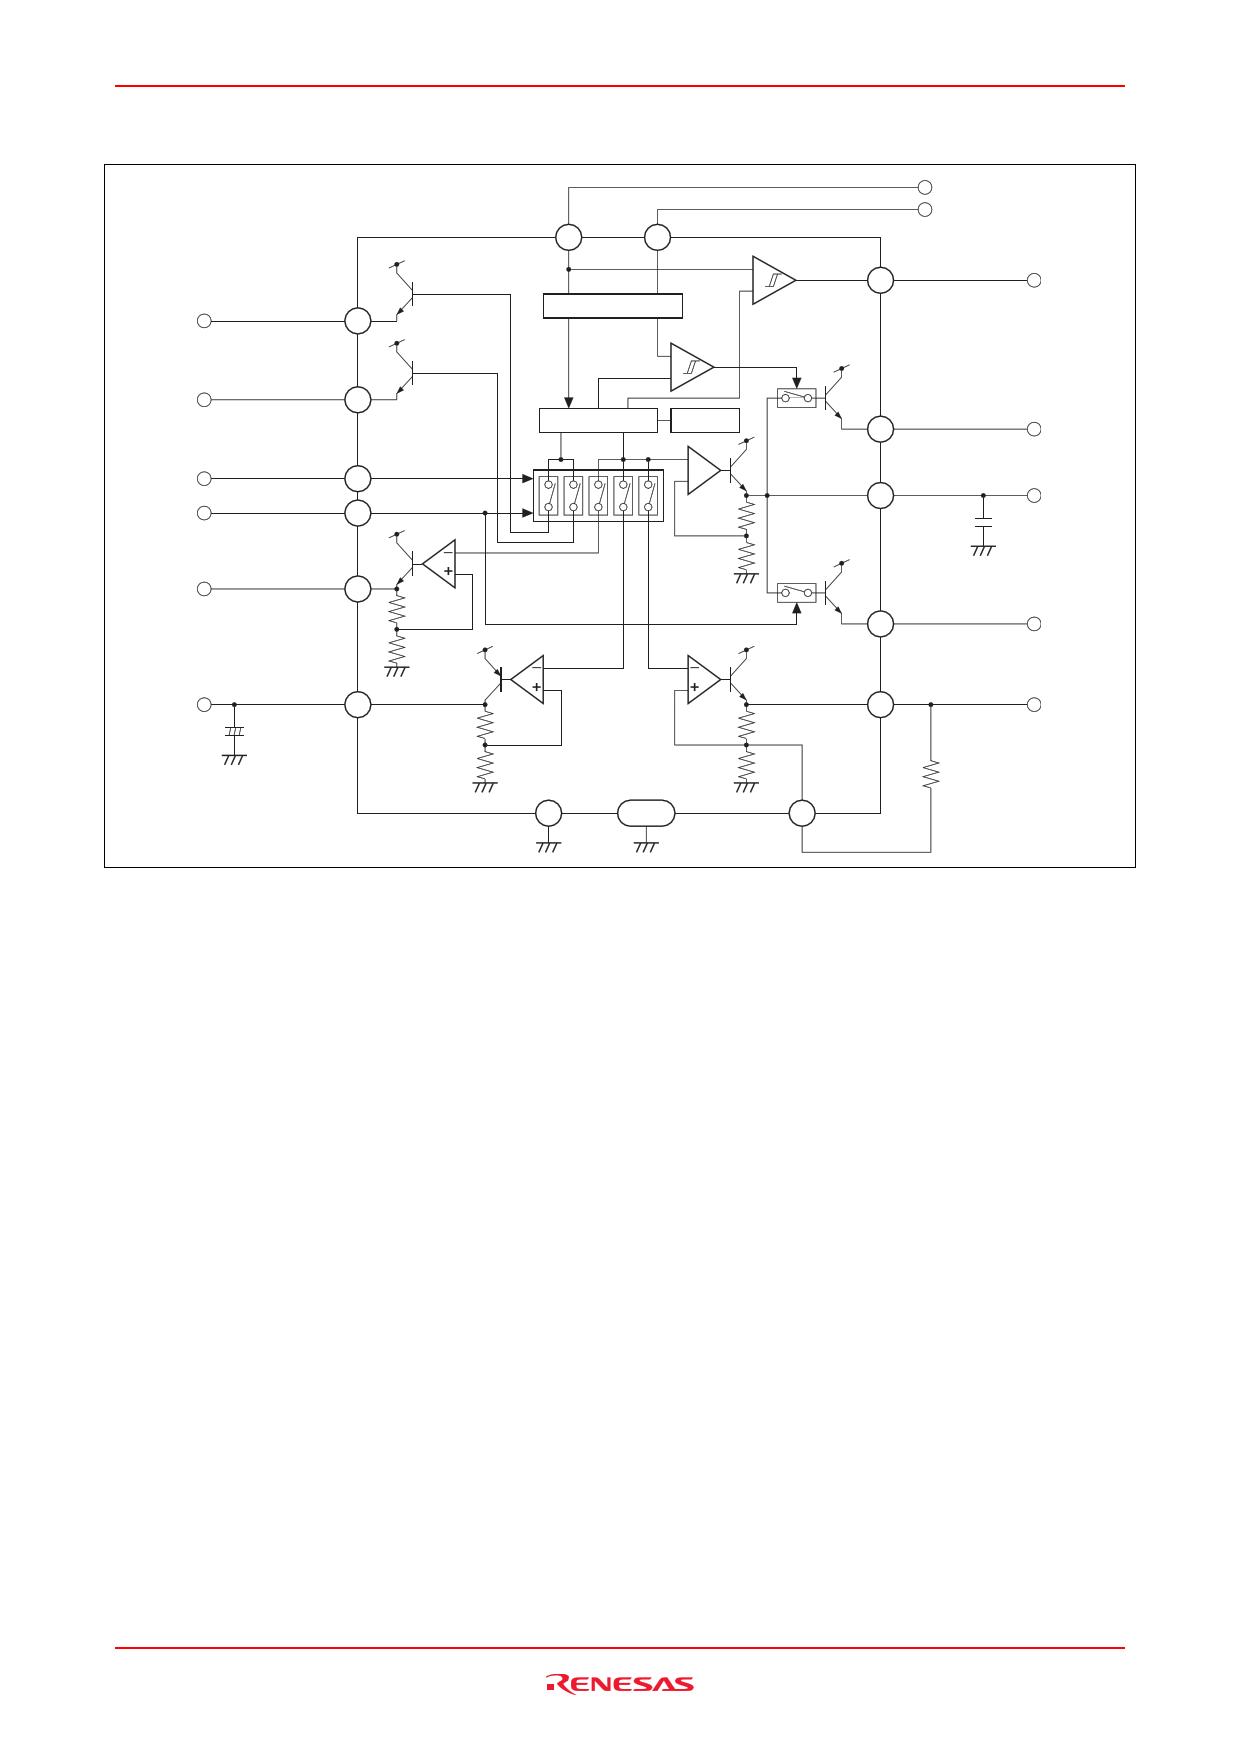 Ha13164ah схема подключения